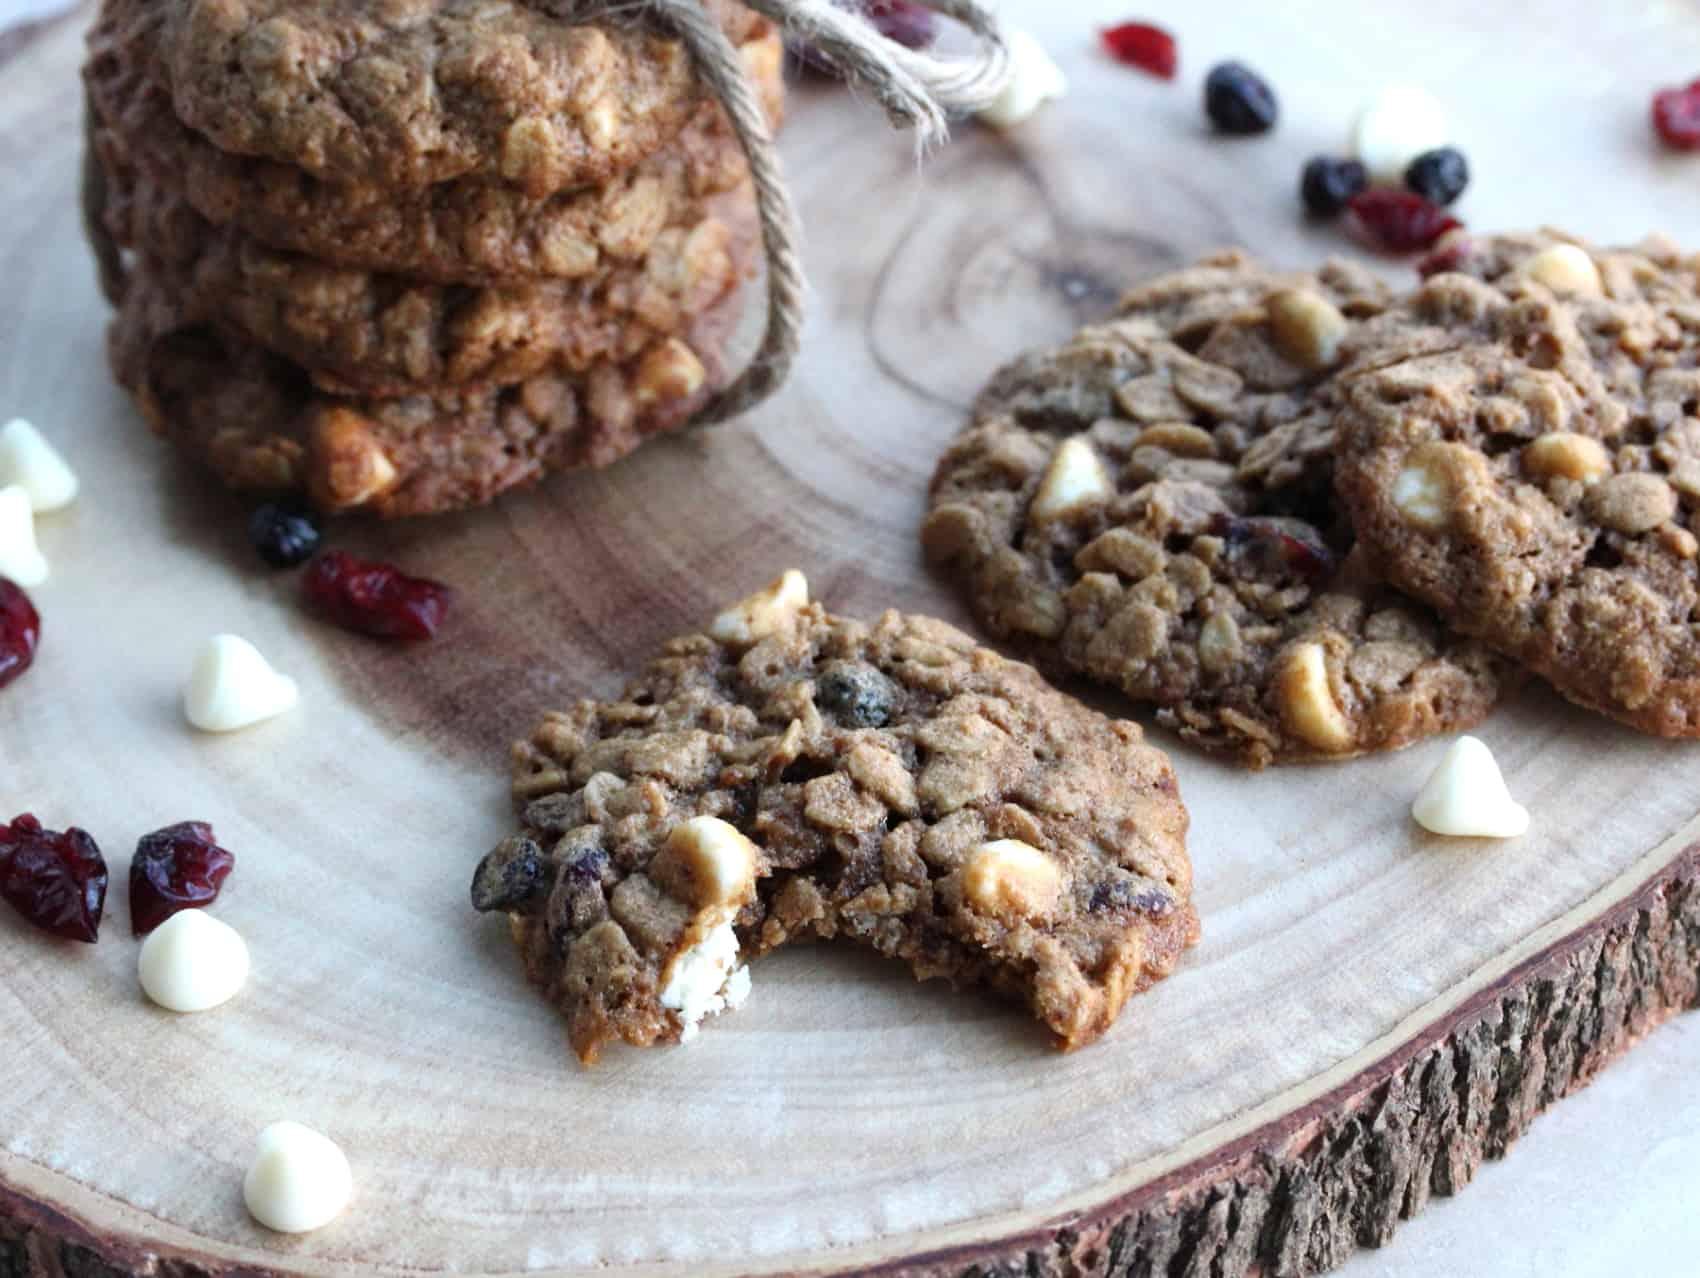 cran-white-choc-cookies-dishing-health